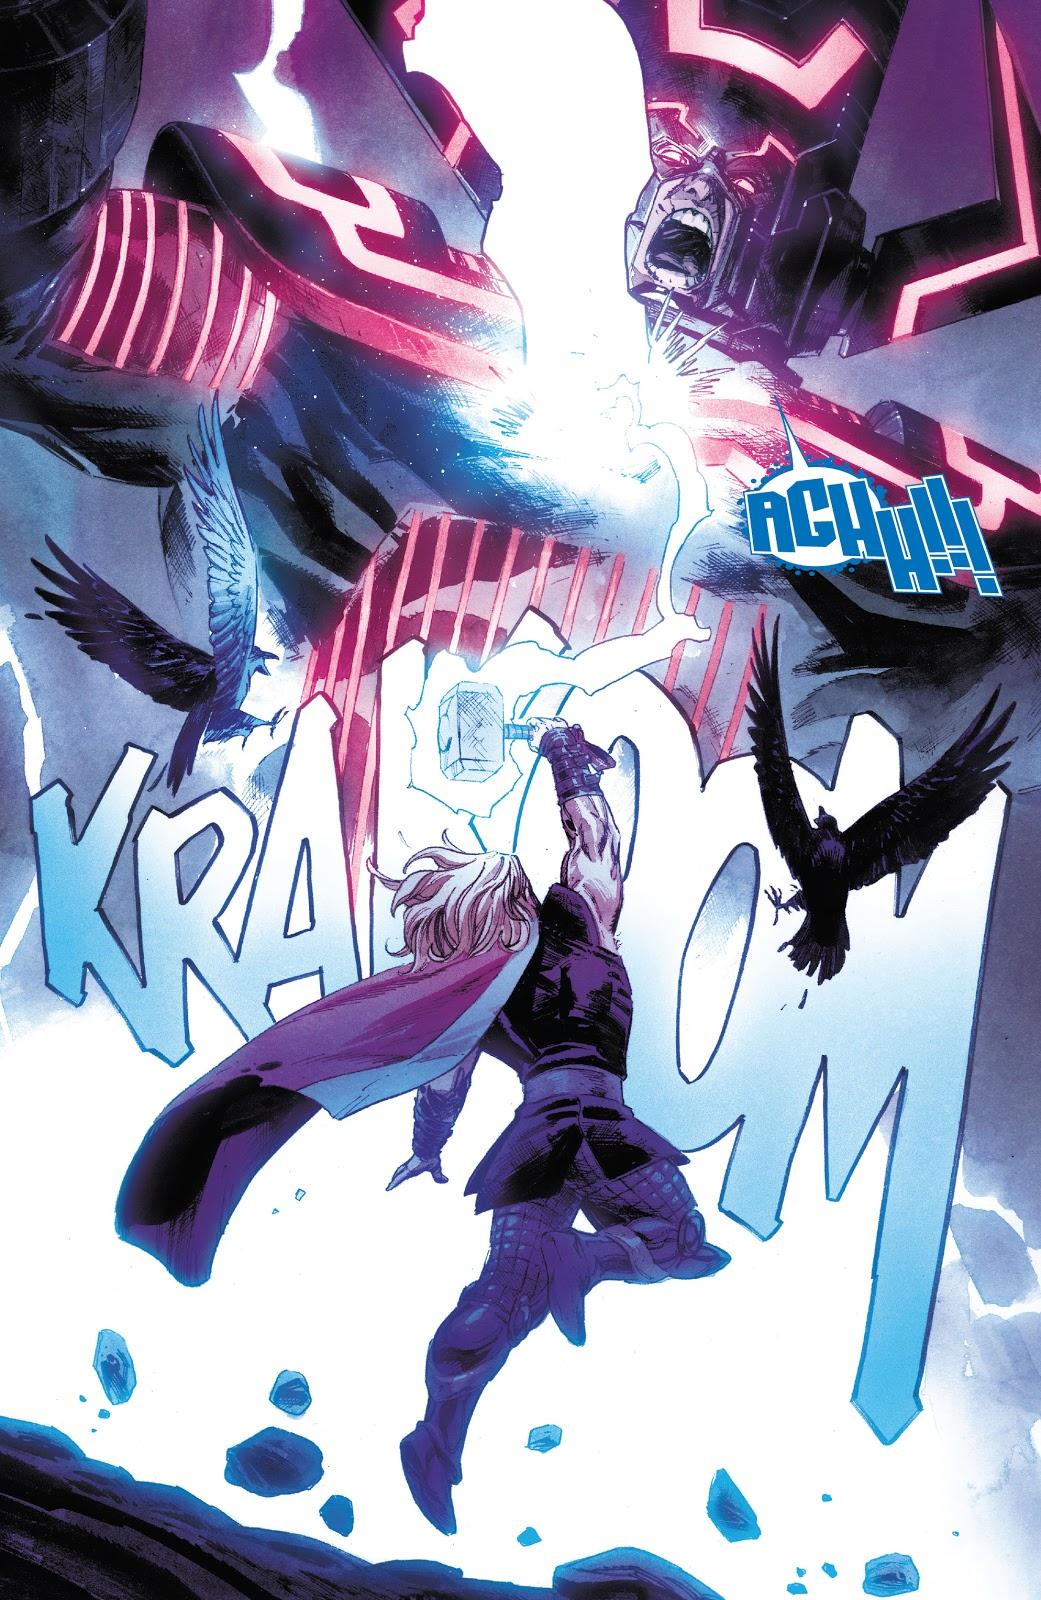 Thor Vol. 6 #4